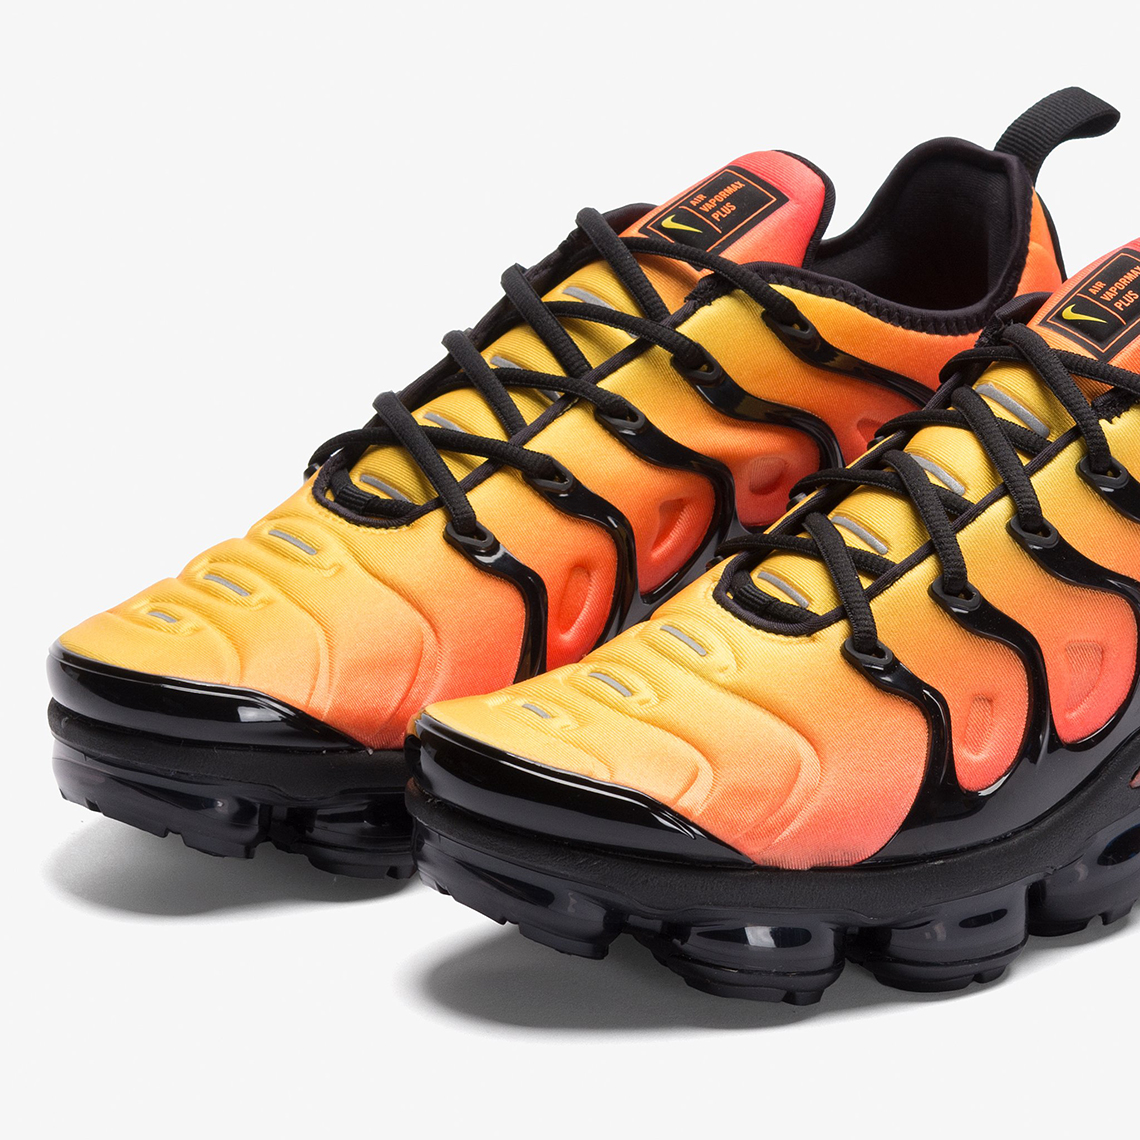 Nike Vapormax Oltre Tramonto rCGuxM